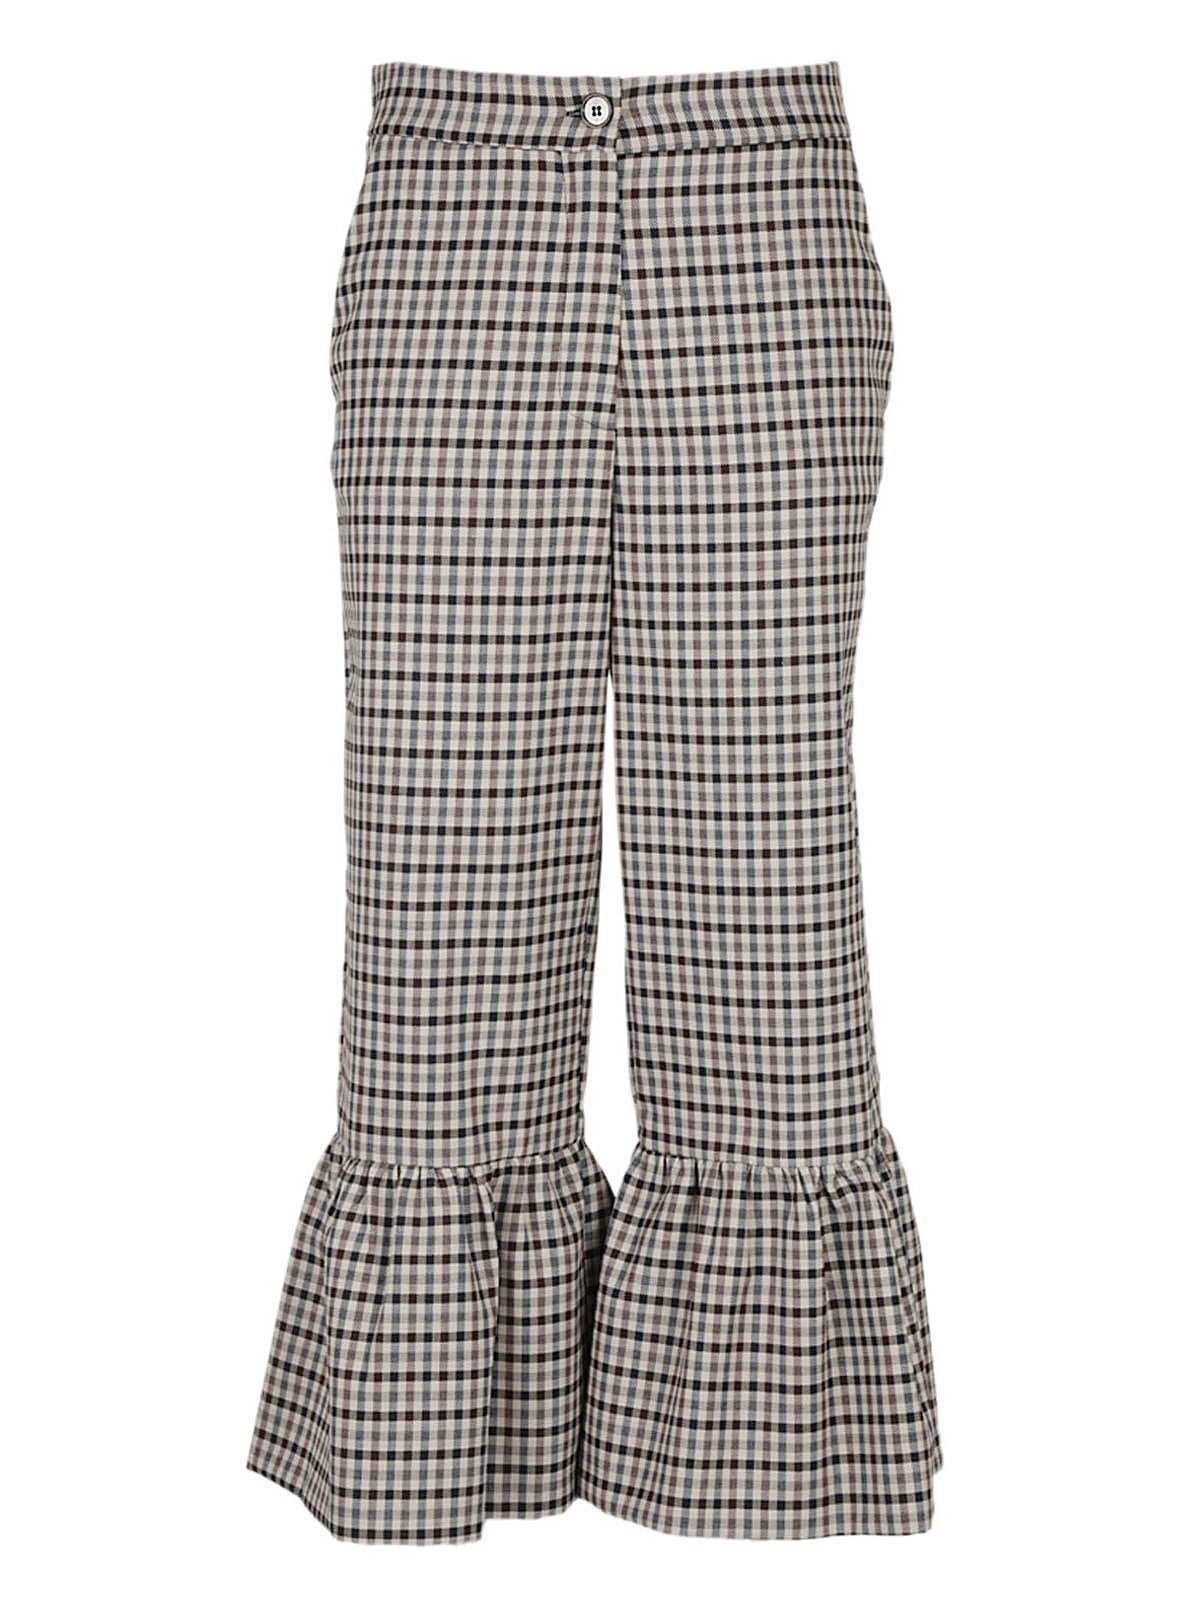 Erika Cavallini Checked Trousers